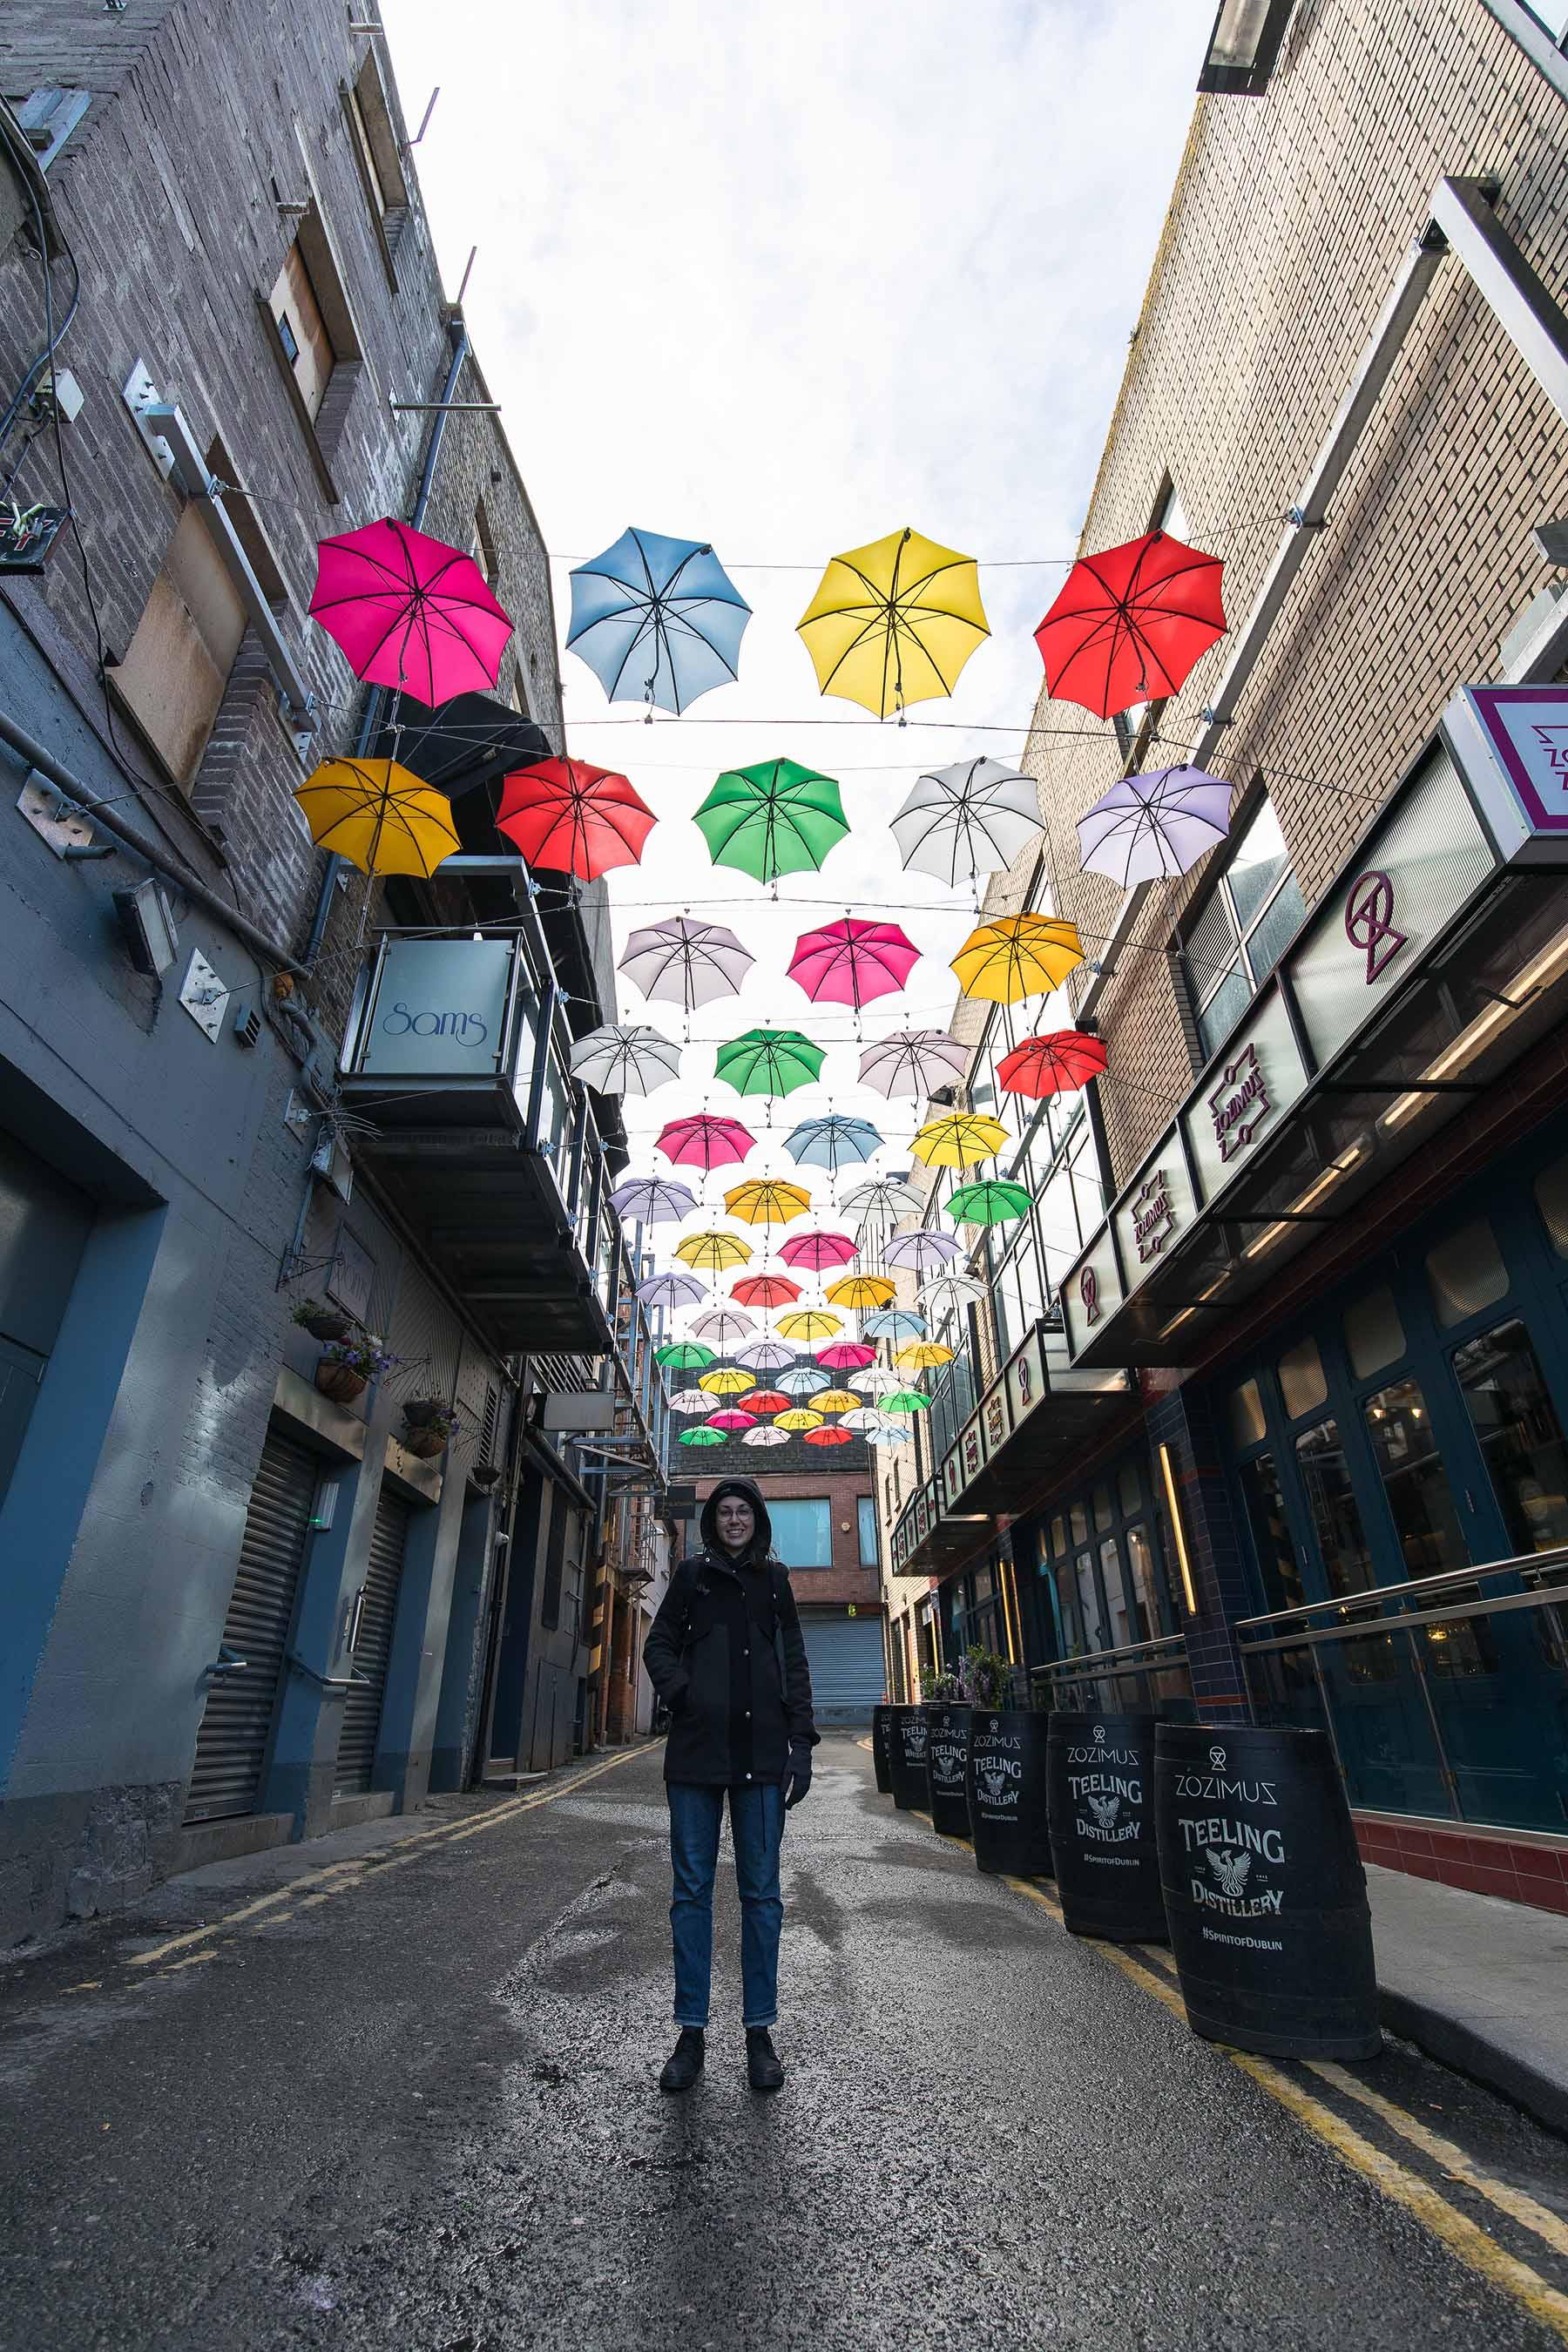 dublin-ireland-europe-umbrella-street-famous-place-city-pub-themovinglens-colourfull-travel-photography-destination-life